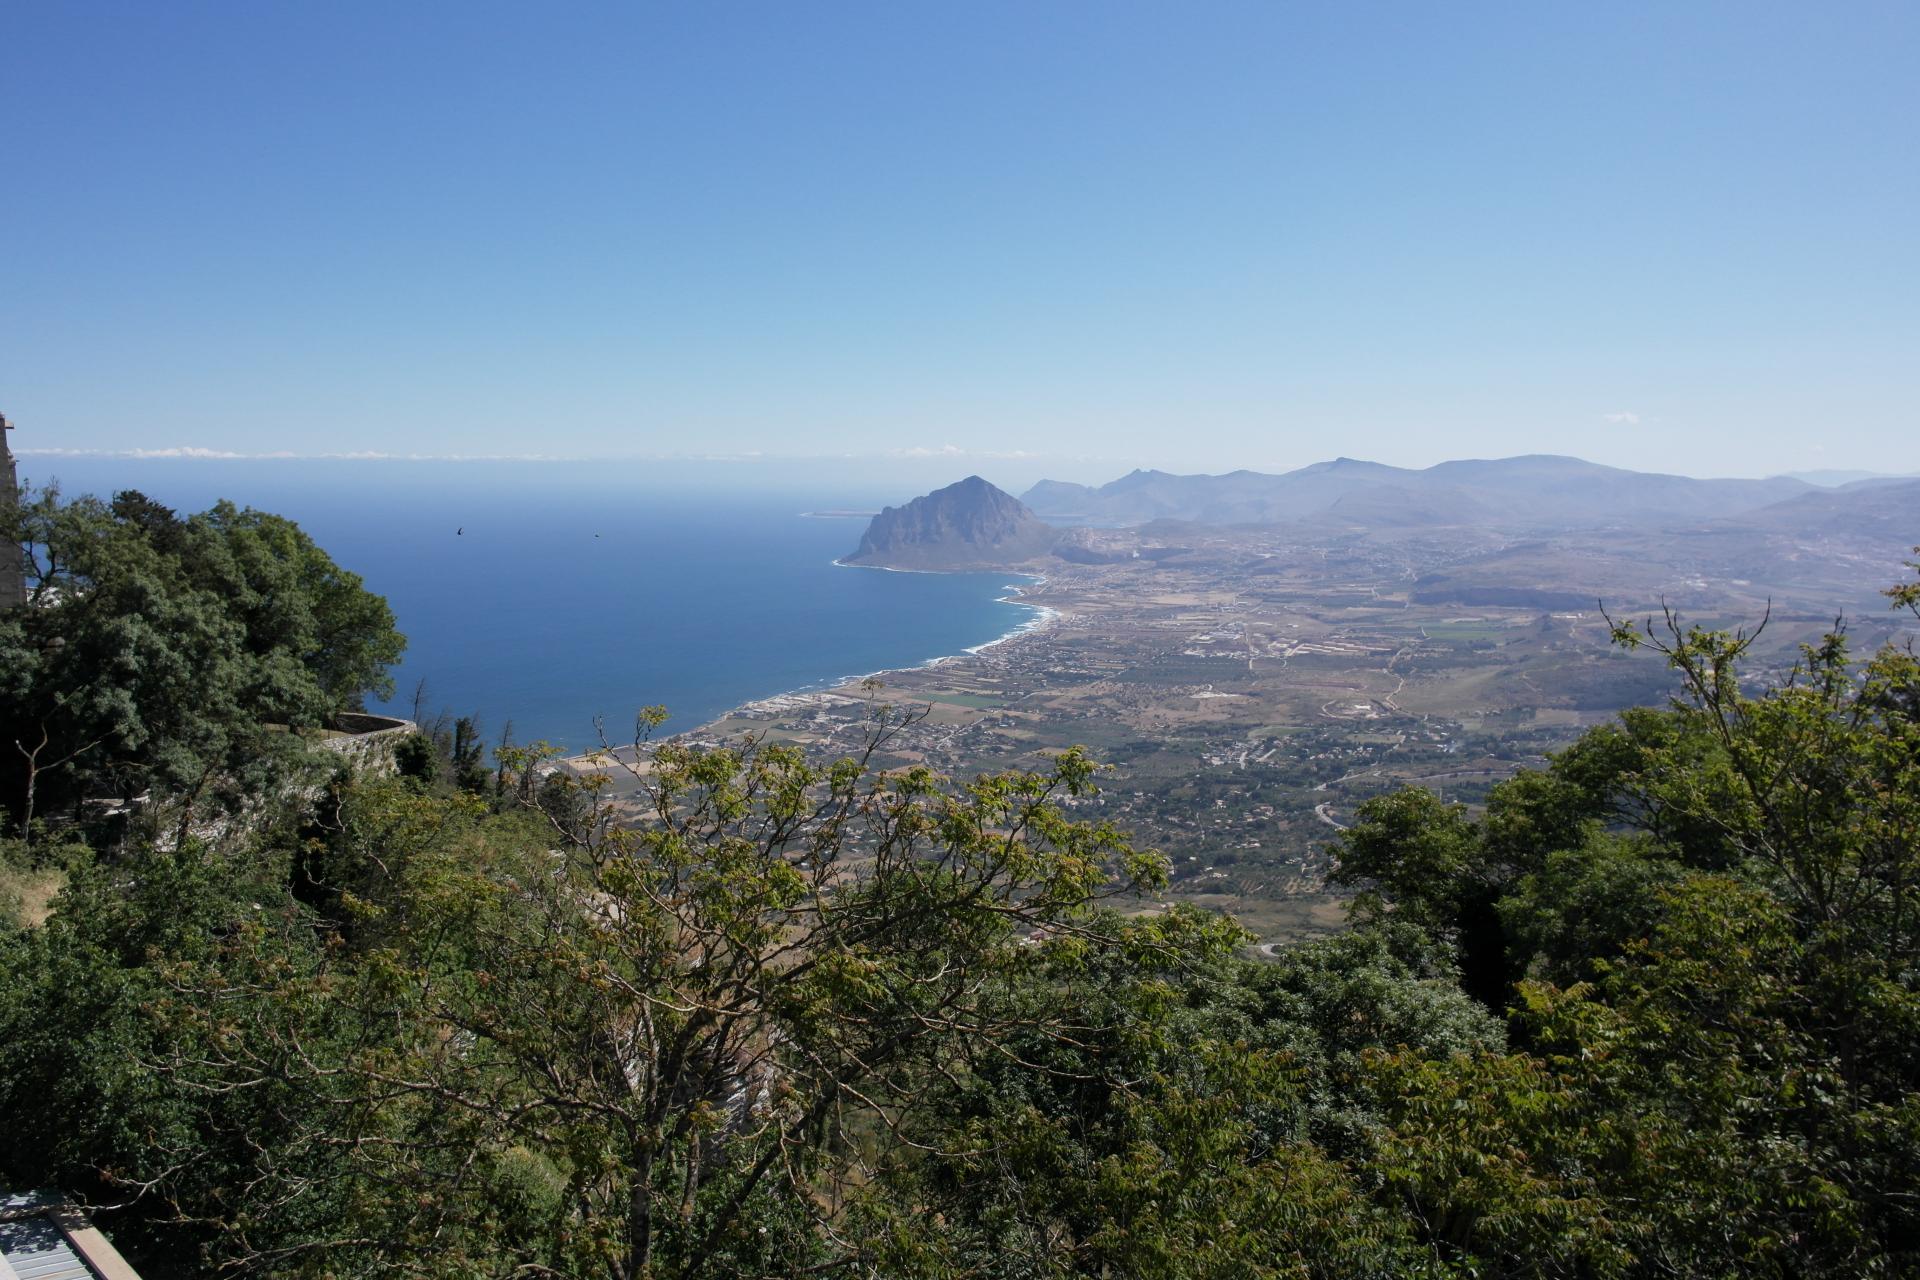 Breathtaking views at every turn while biking Sicily!